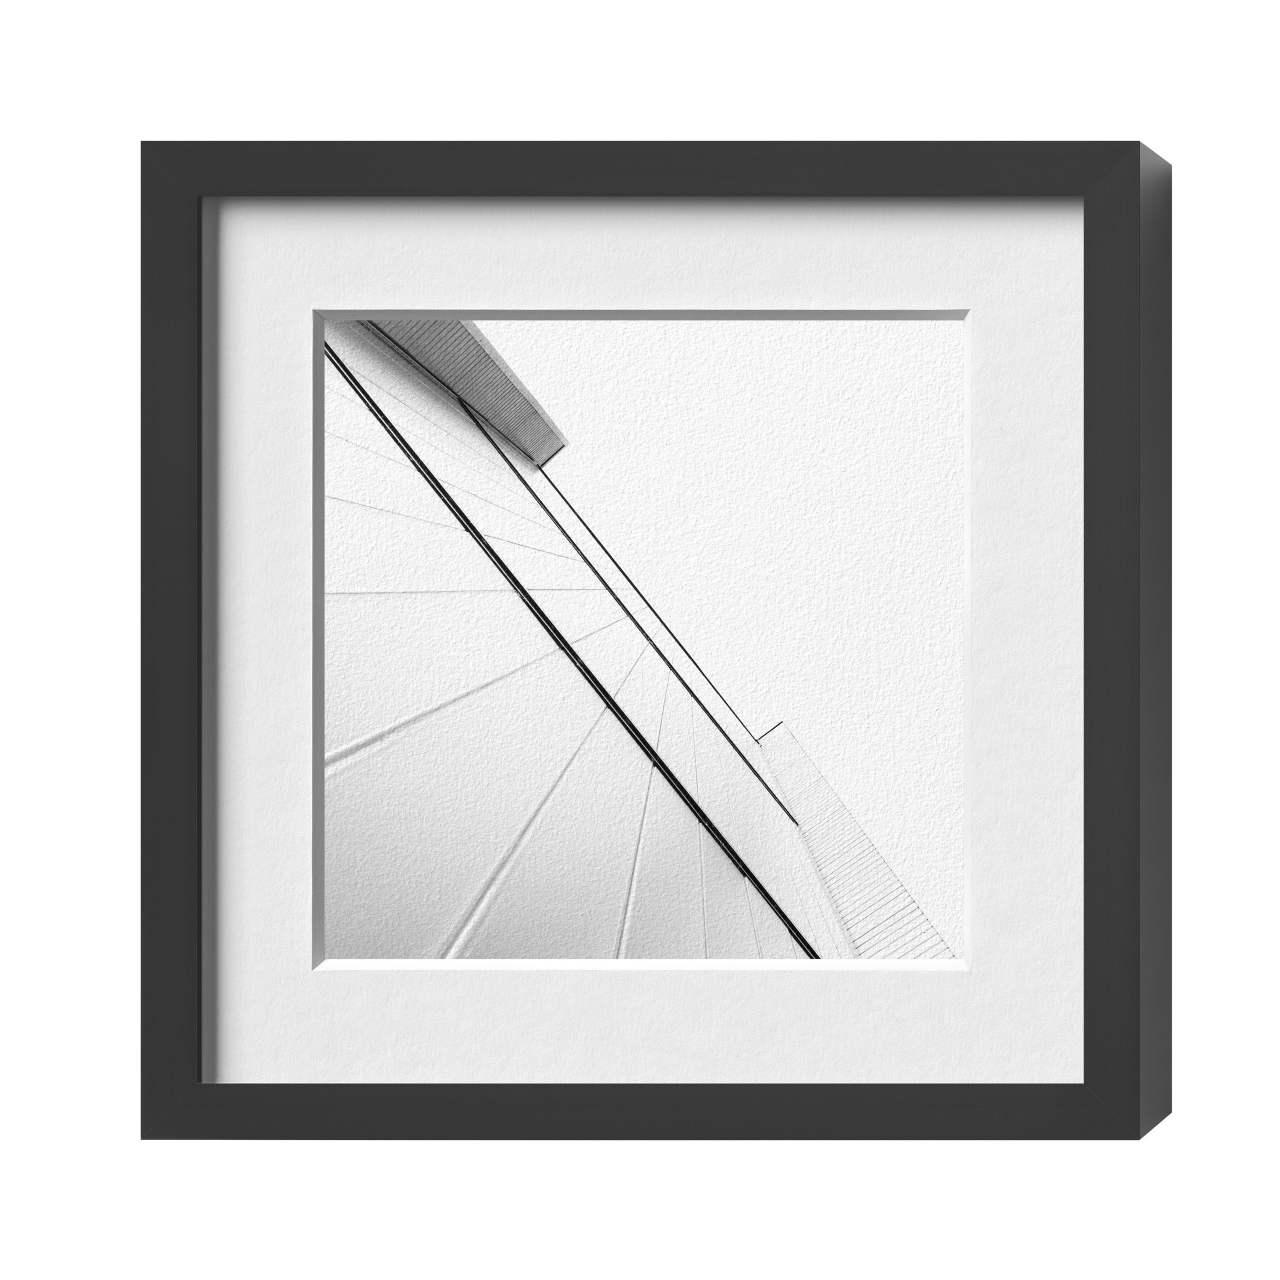 Bilderrahmen für Kunstwerke | HALBE Protect-Magnetrahmen